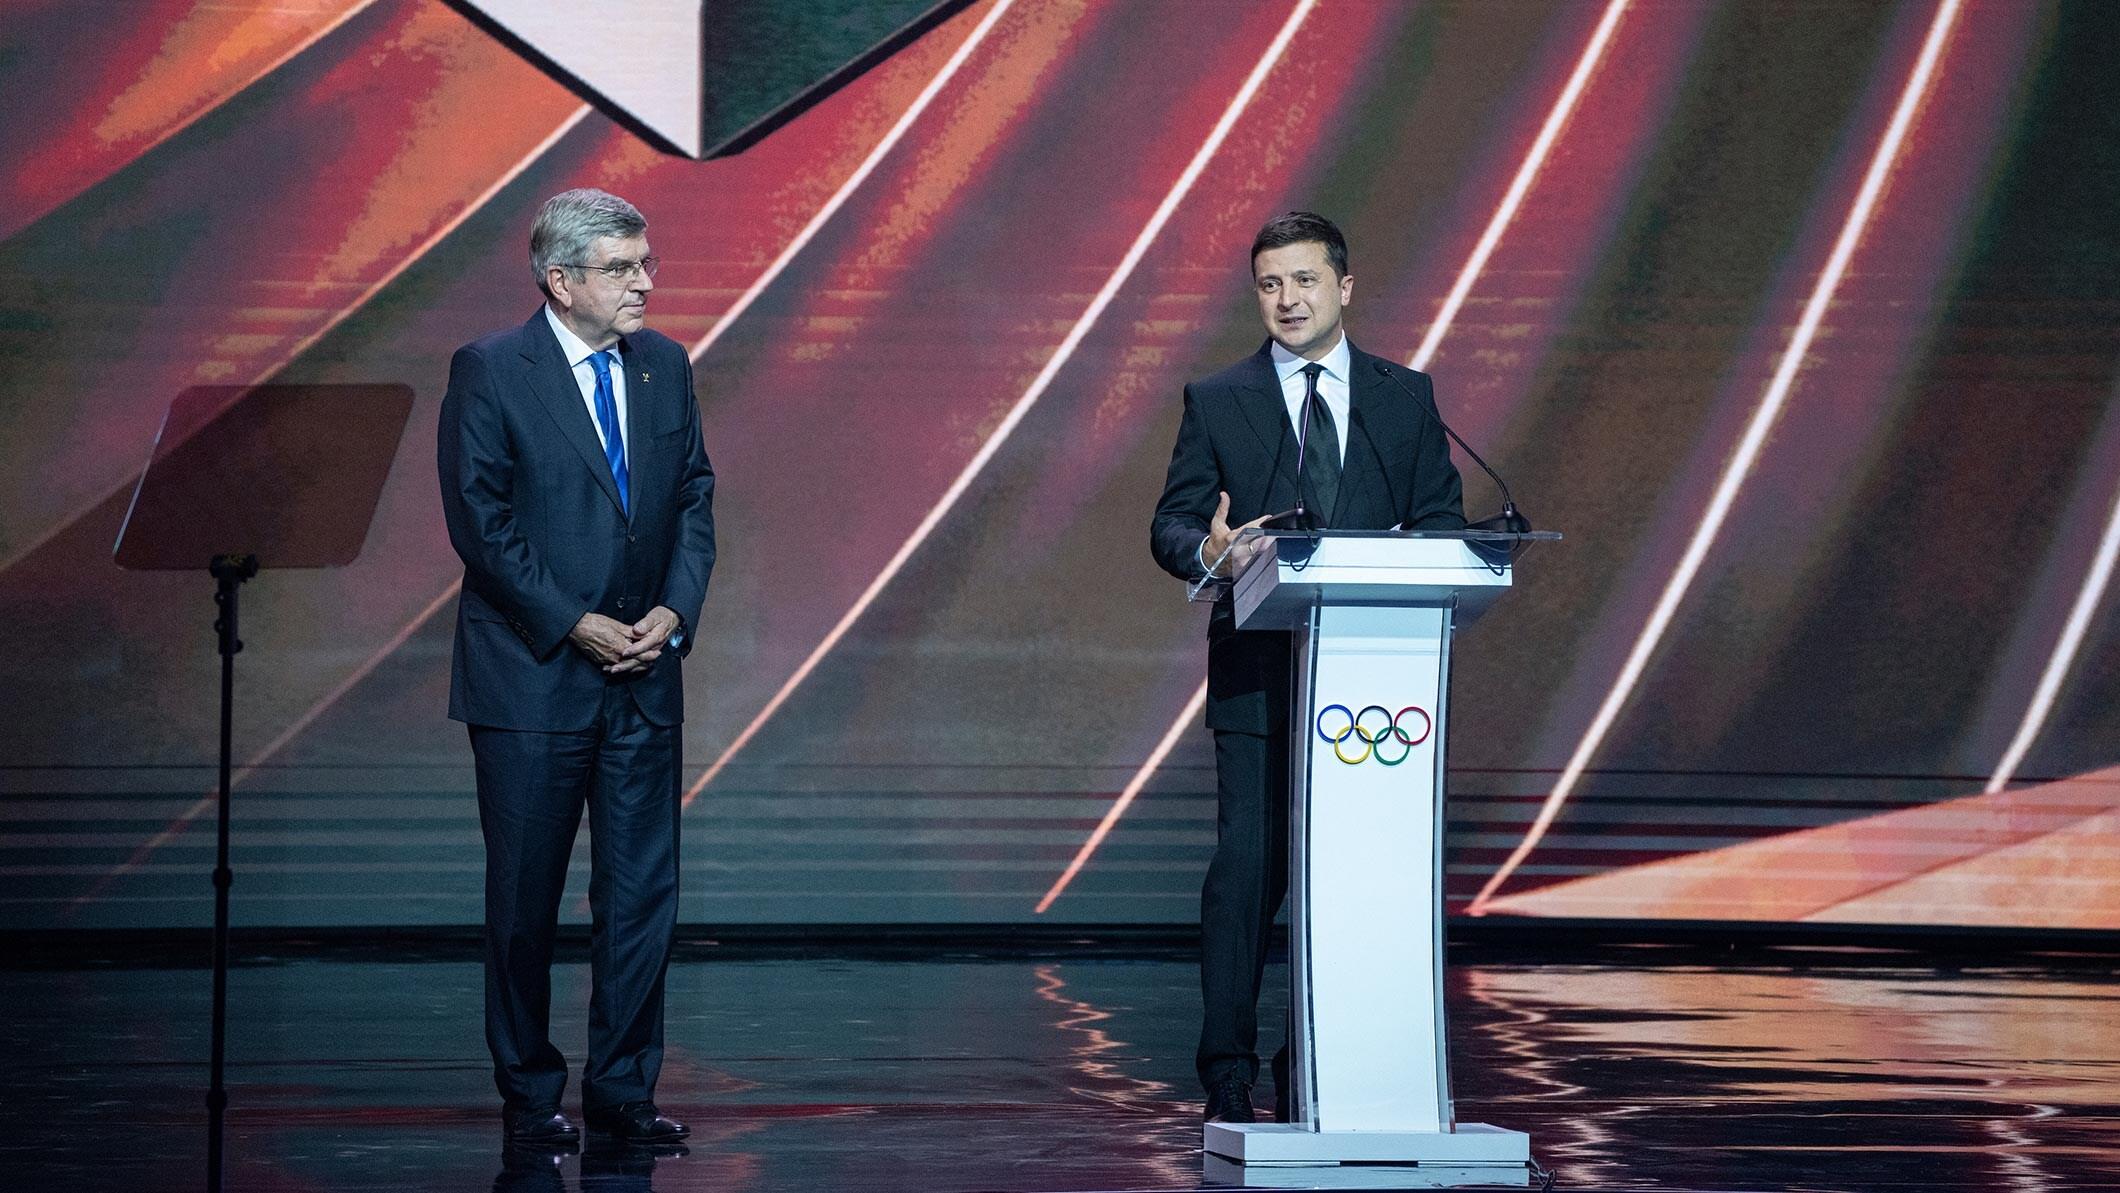 IOC President Thomas Bach and Ukrainian President Volodymyr Zelensky